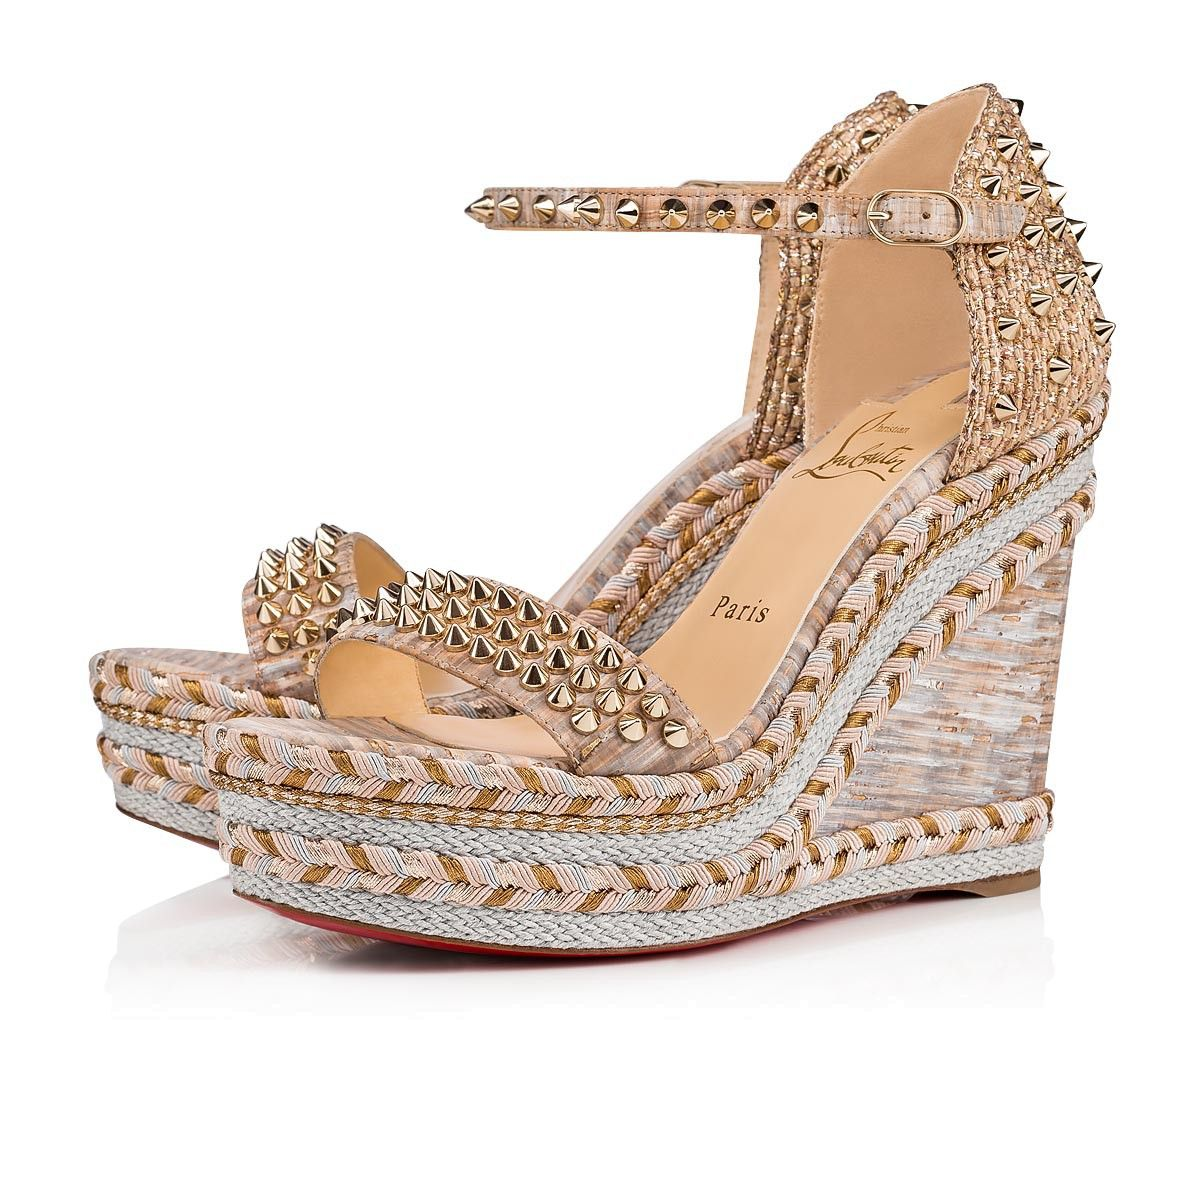 7a43730dc40 Madmonica 120 Version Naturelle Cork - Women Shoes - Christian ...